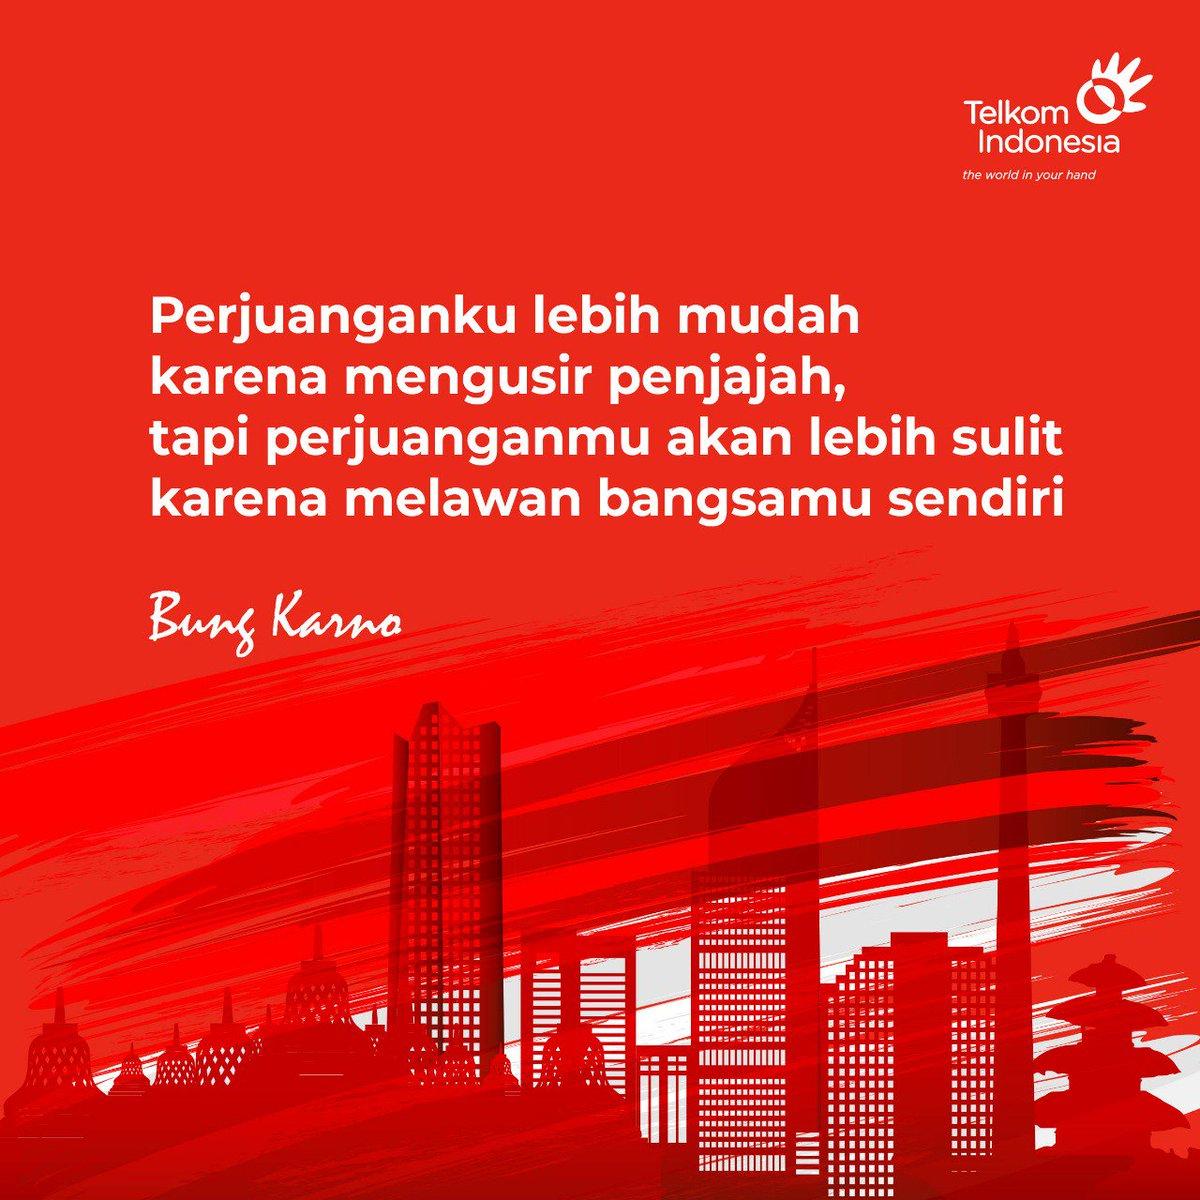 Telkom Indonesia On Twitter Kata Kata Mutiara Kemerdekaan Melawan Penjajah Memang Telah Usai Tapi Perjuangan Melawan Ketidak Pedulian Dari Diri Sendiri Masih Berlanjut Seperti Kata Sang Proklamator Di Bawah Ini 73thnindonesiabumnhadiruntuknegeri